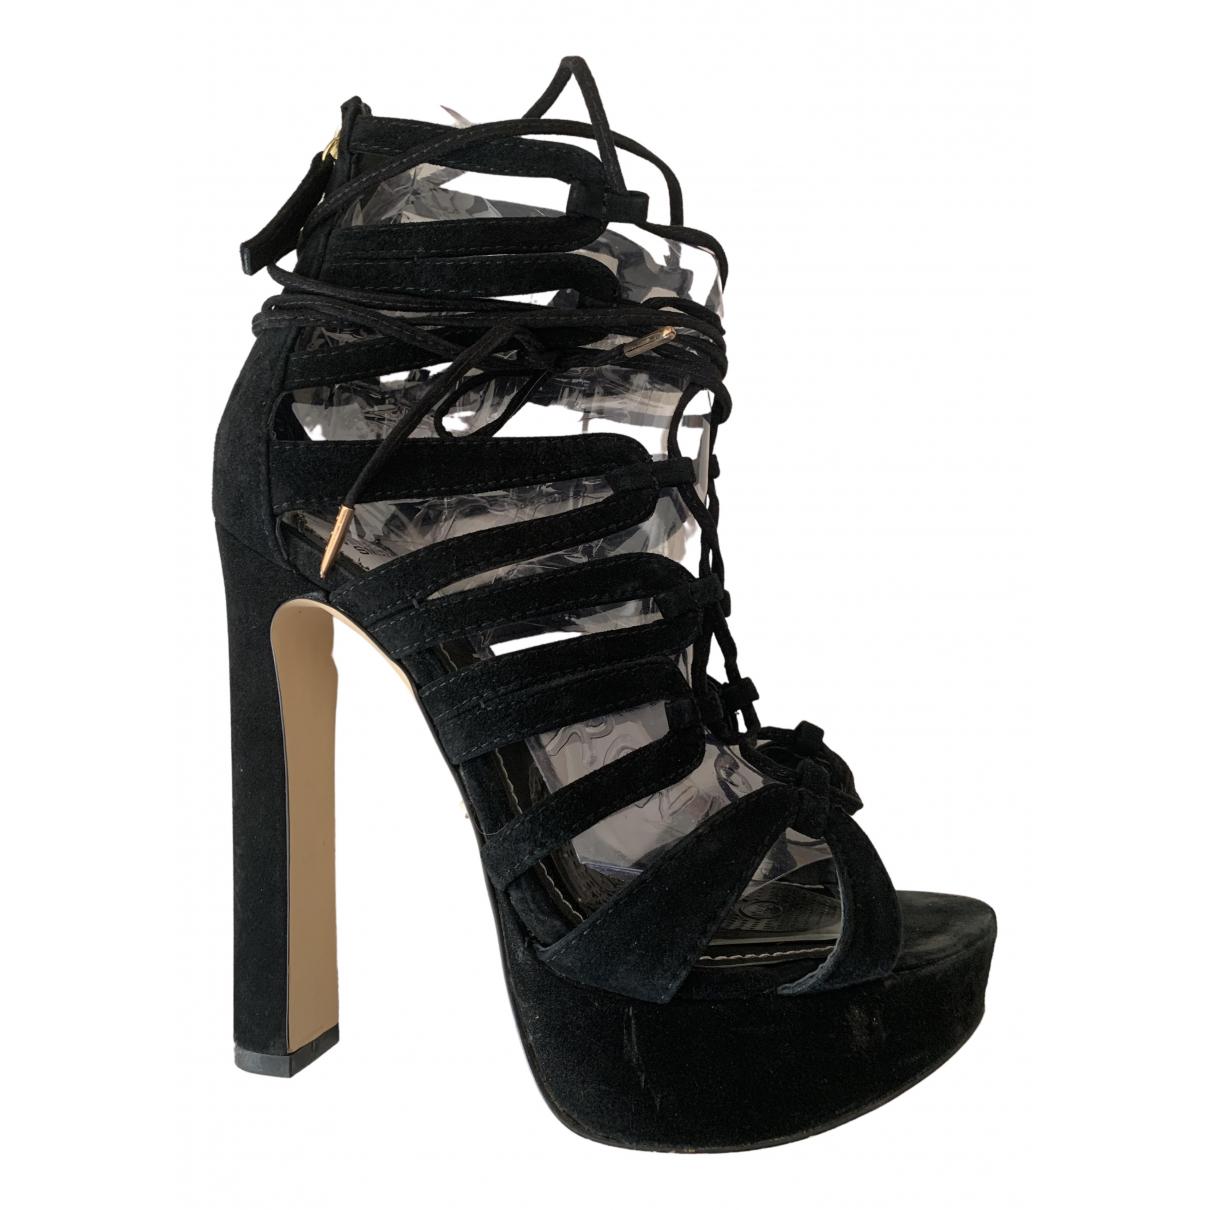 Windsor Smith N Black Suede Heels for Women 37 IT